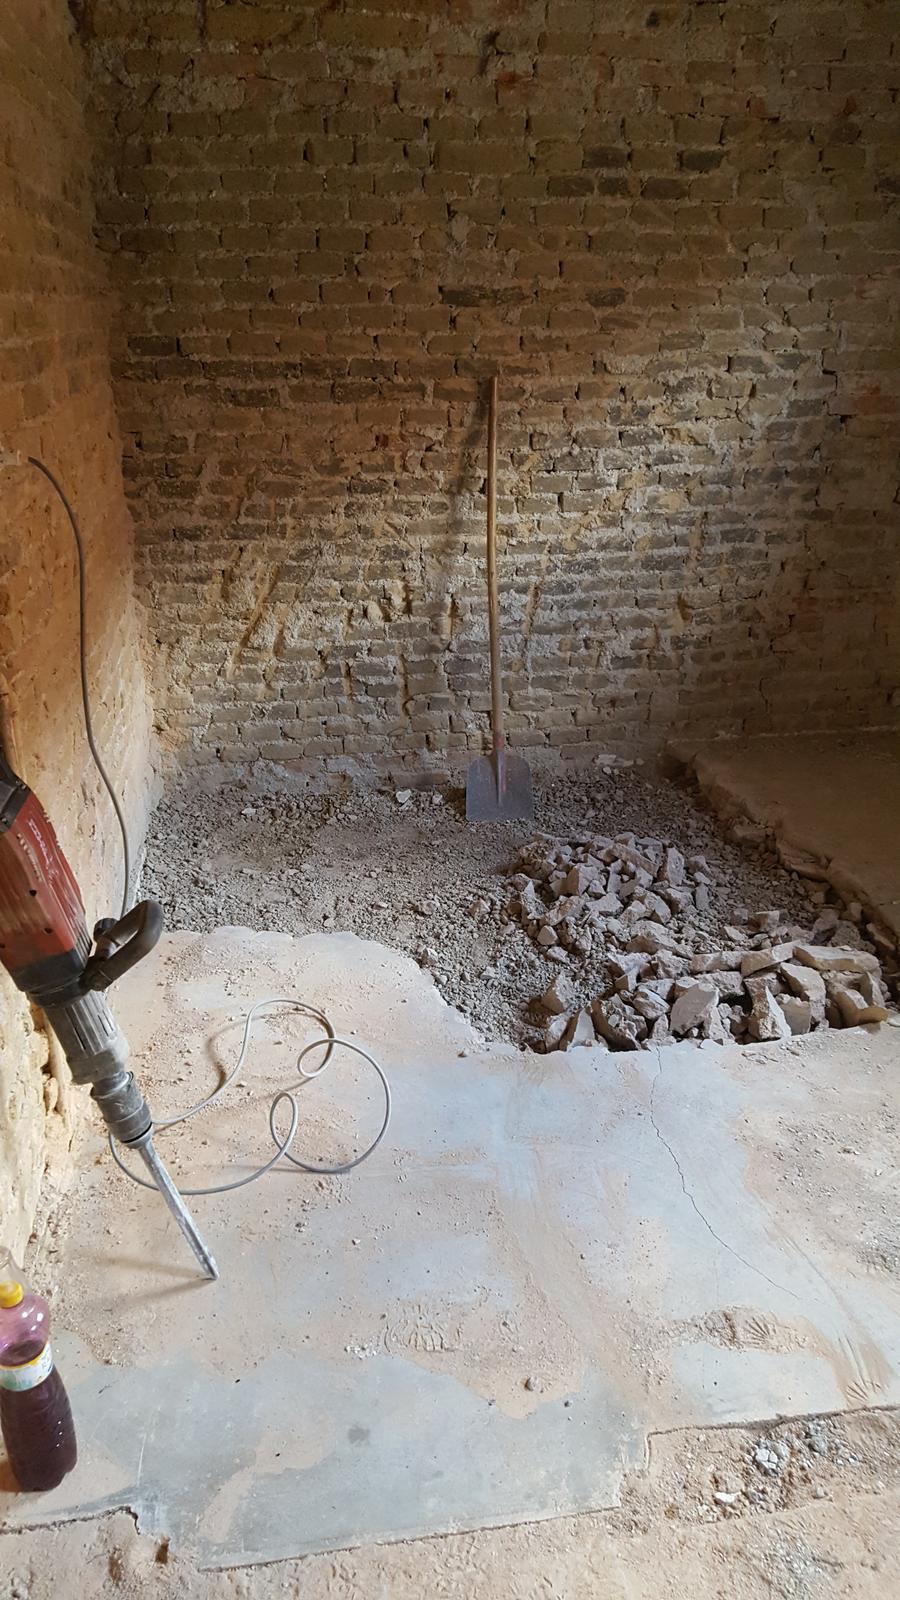 Prerabka domu v historickom centre - zacala sa znizovat podlaha na uroven kuchyne,verim ze do zajtra vecera to bude hotove